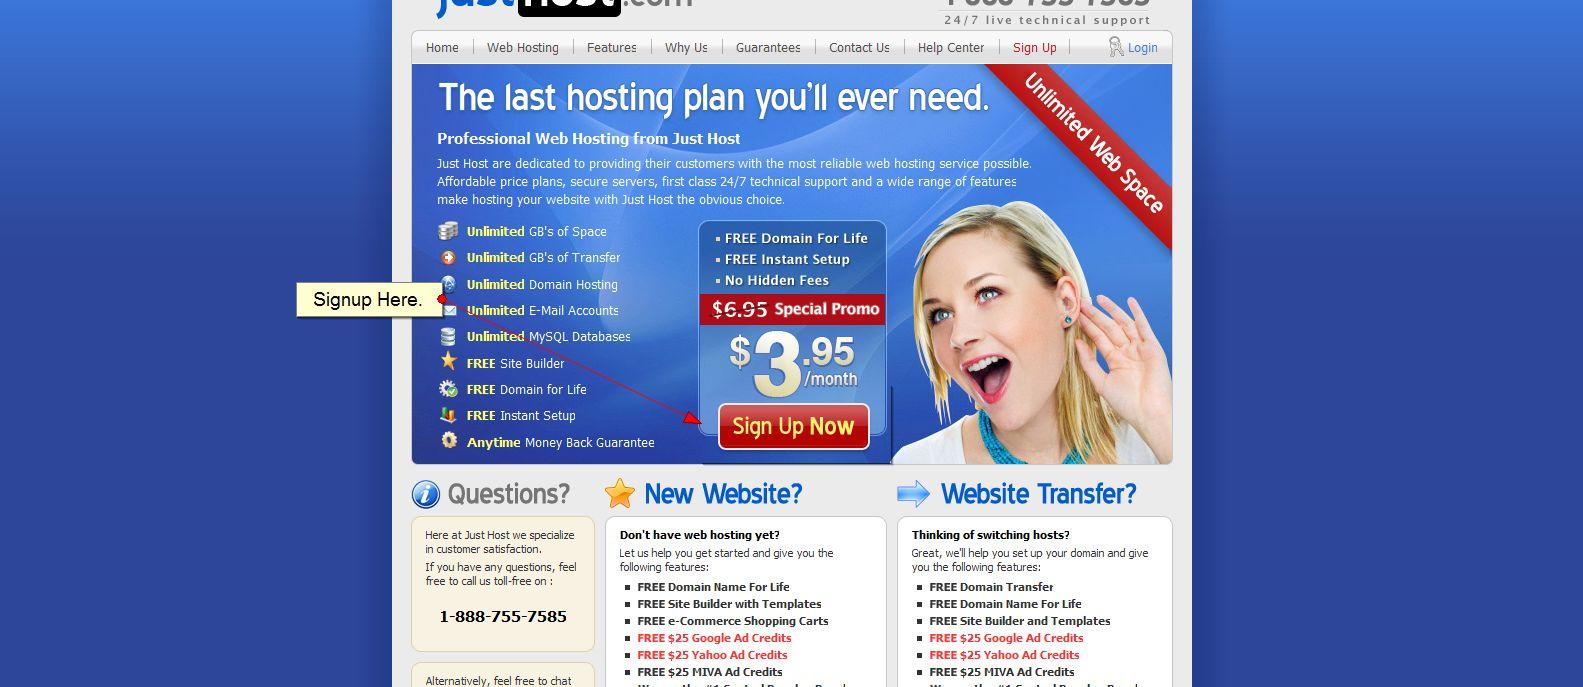 [FireShot+Pro+capture+#24+-+'Web+Hosting+_+Professional+Web+Hosting+from+Just+Host'+-+www_justhost_com.jpg]